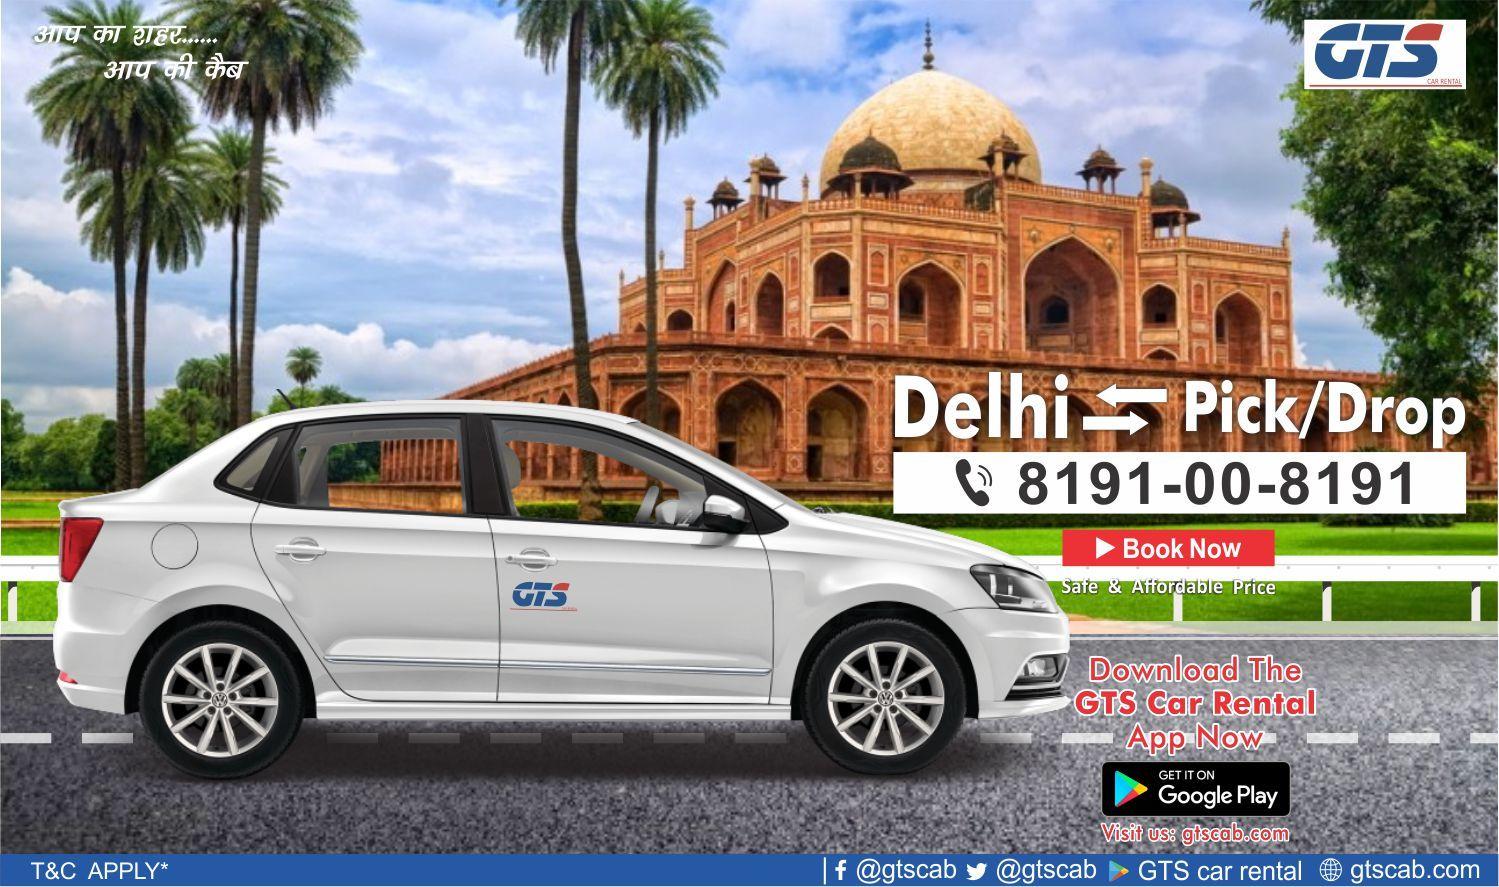 Cab service in delhi car rental service taxi service